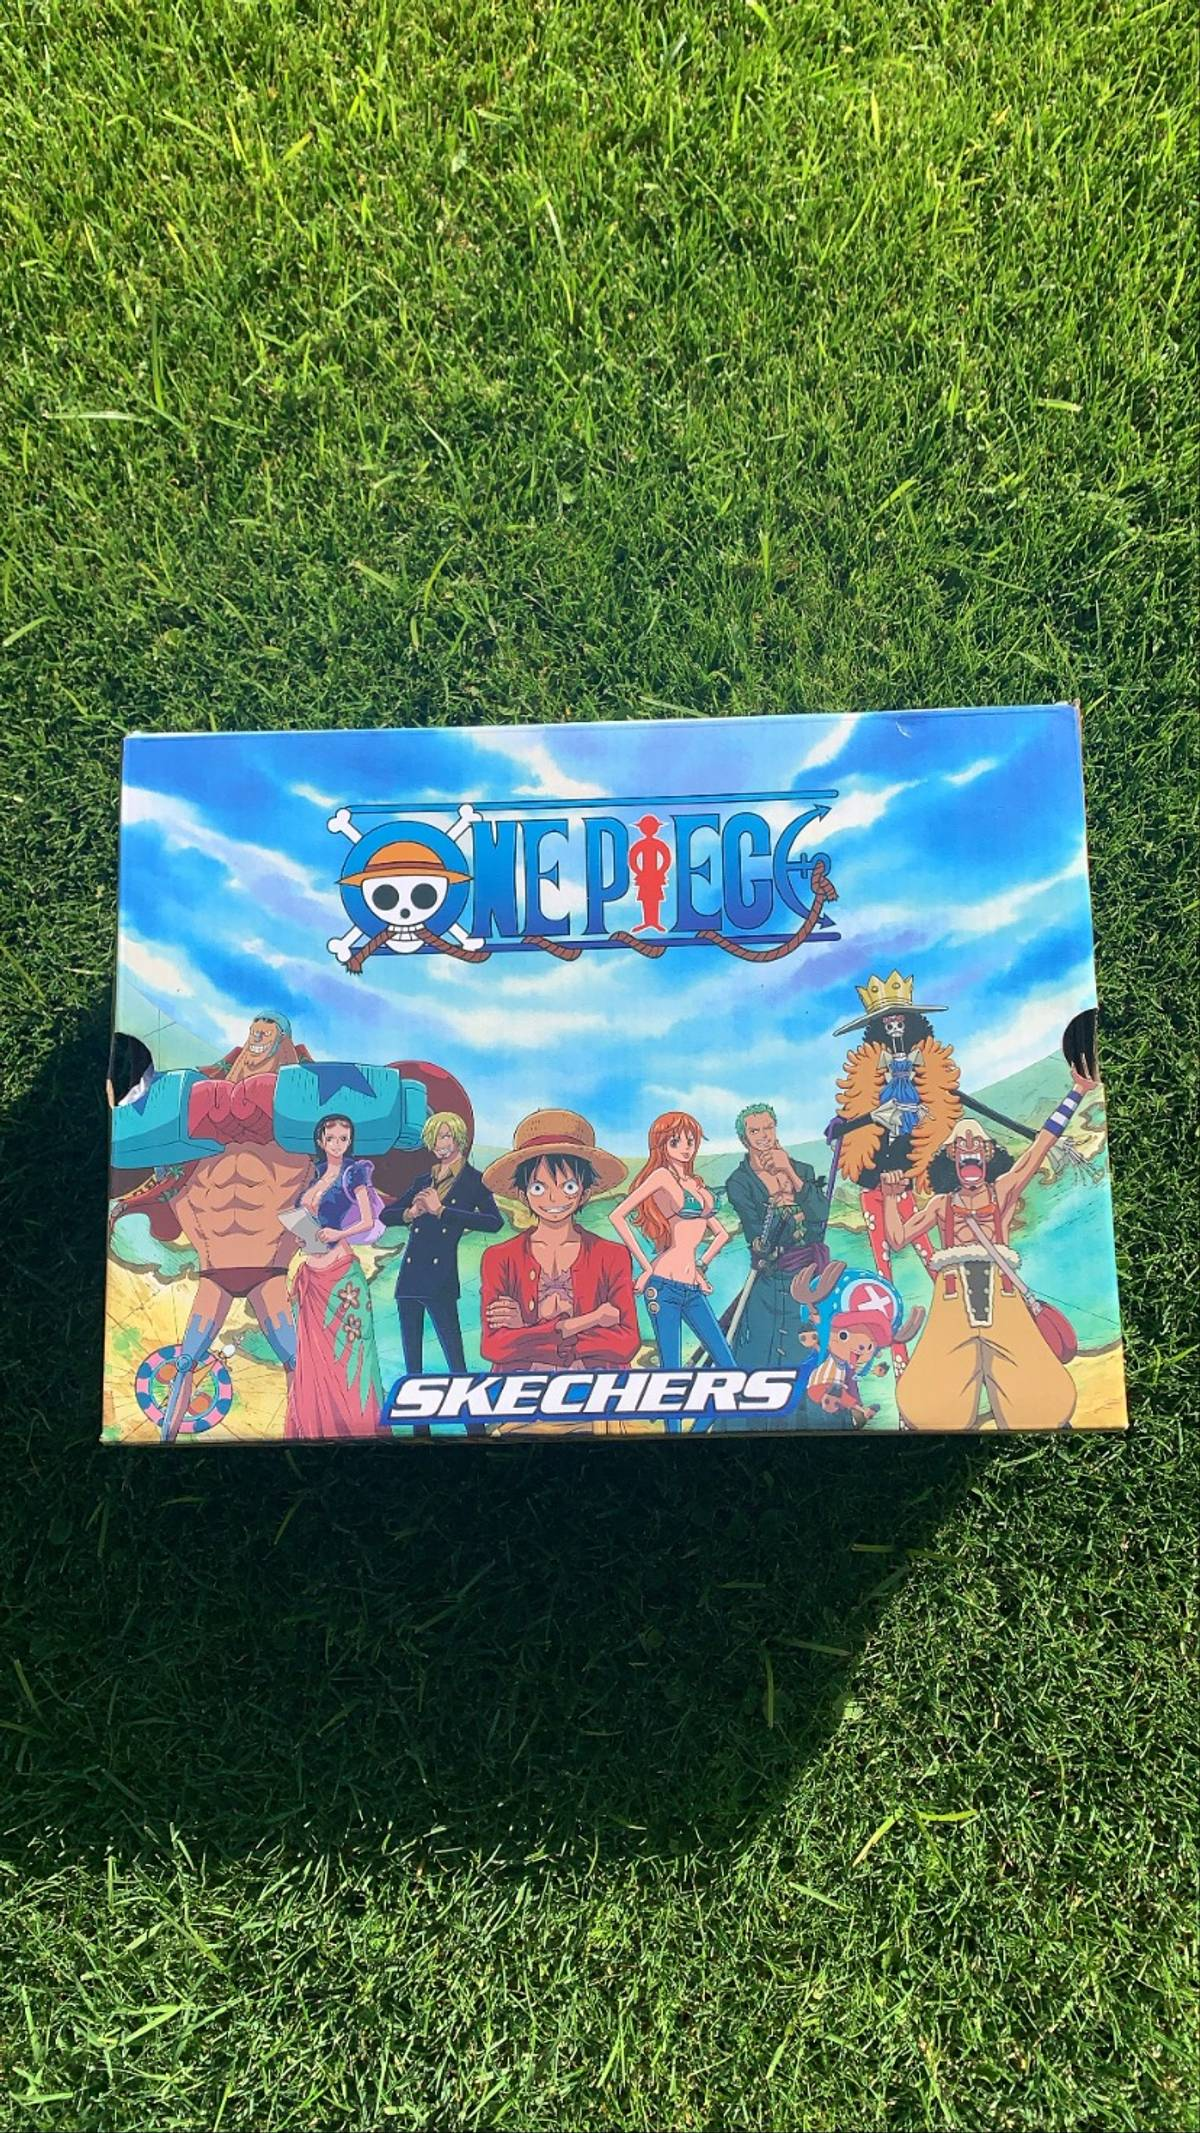 Vintage Deadstock One Piece X Skechers Sanji Edition Grailed